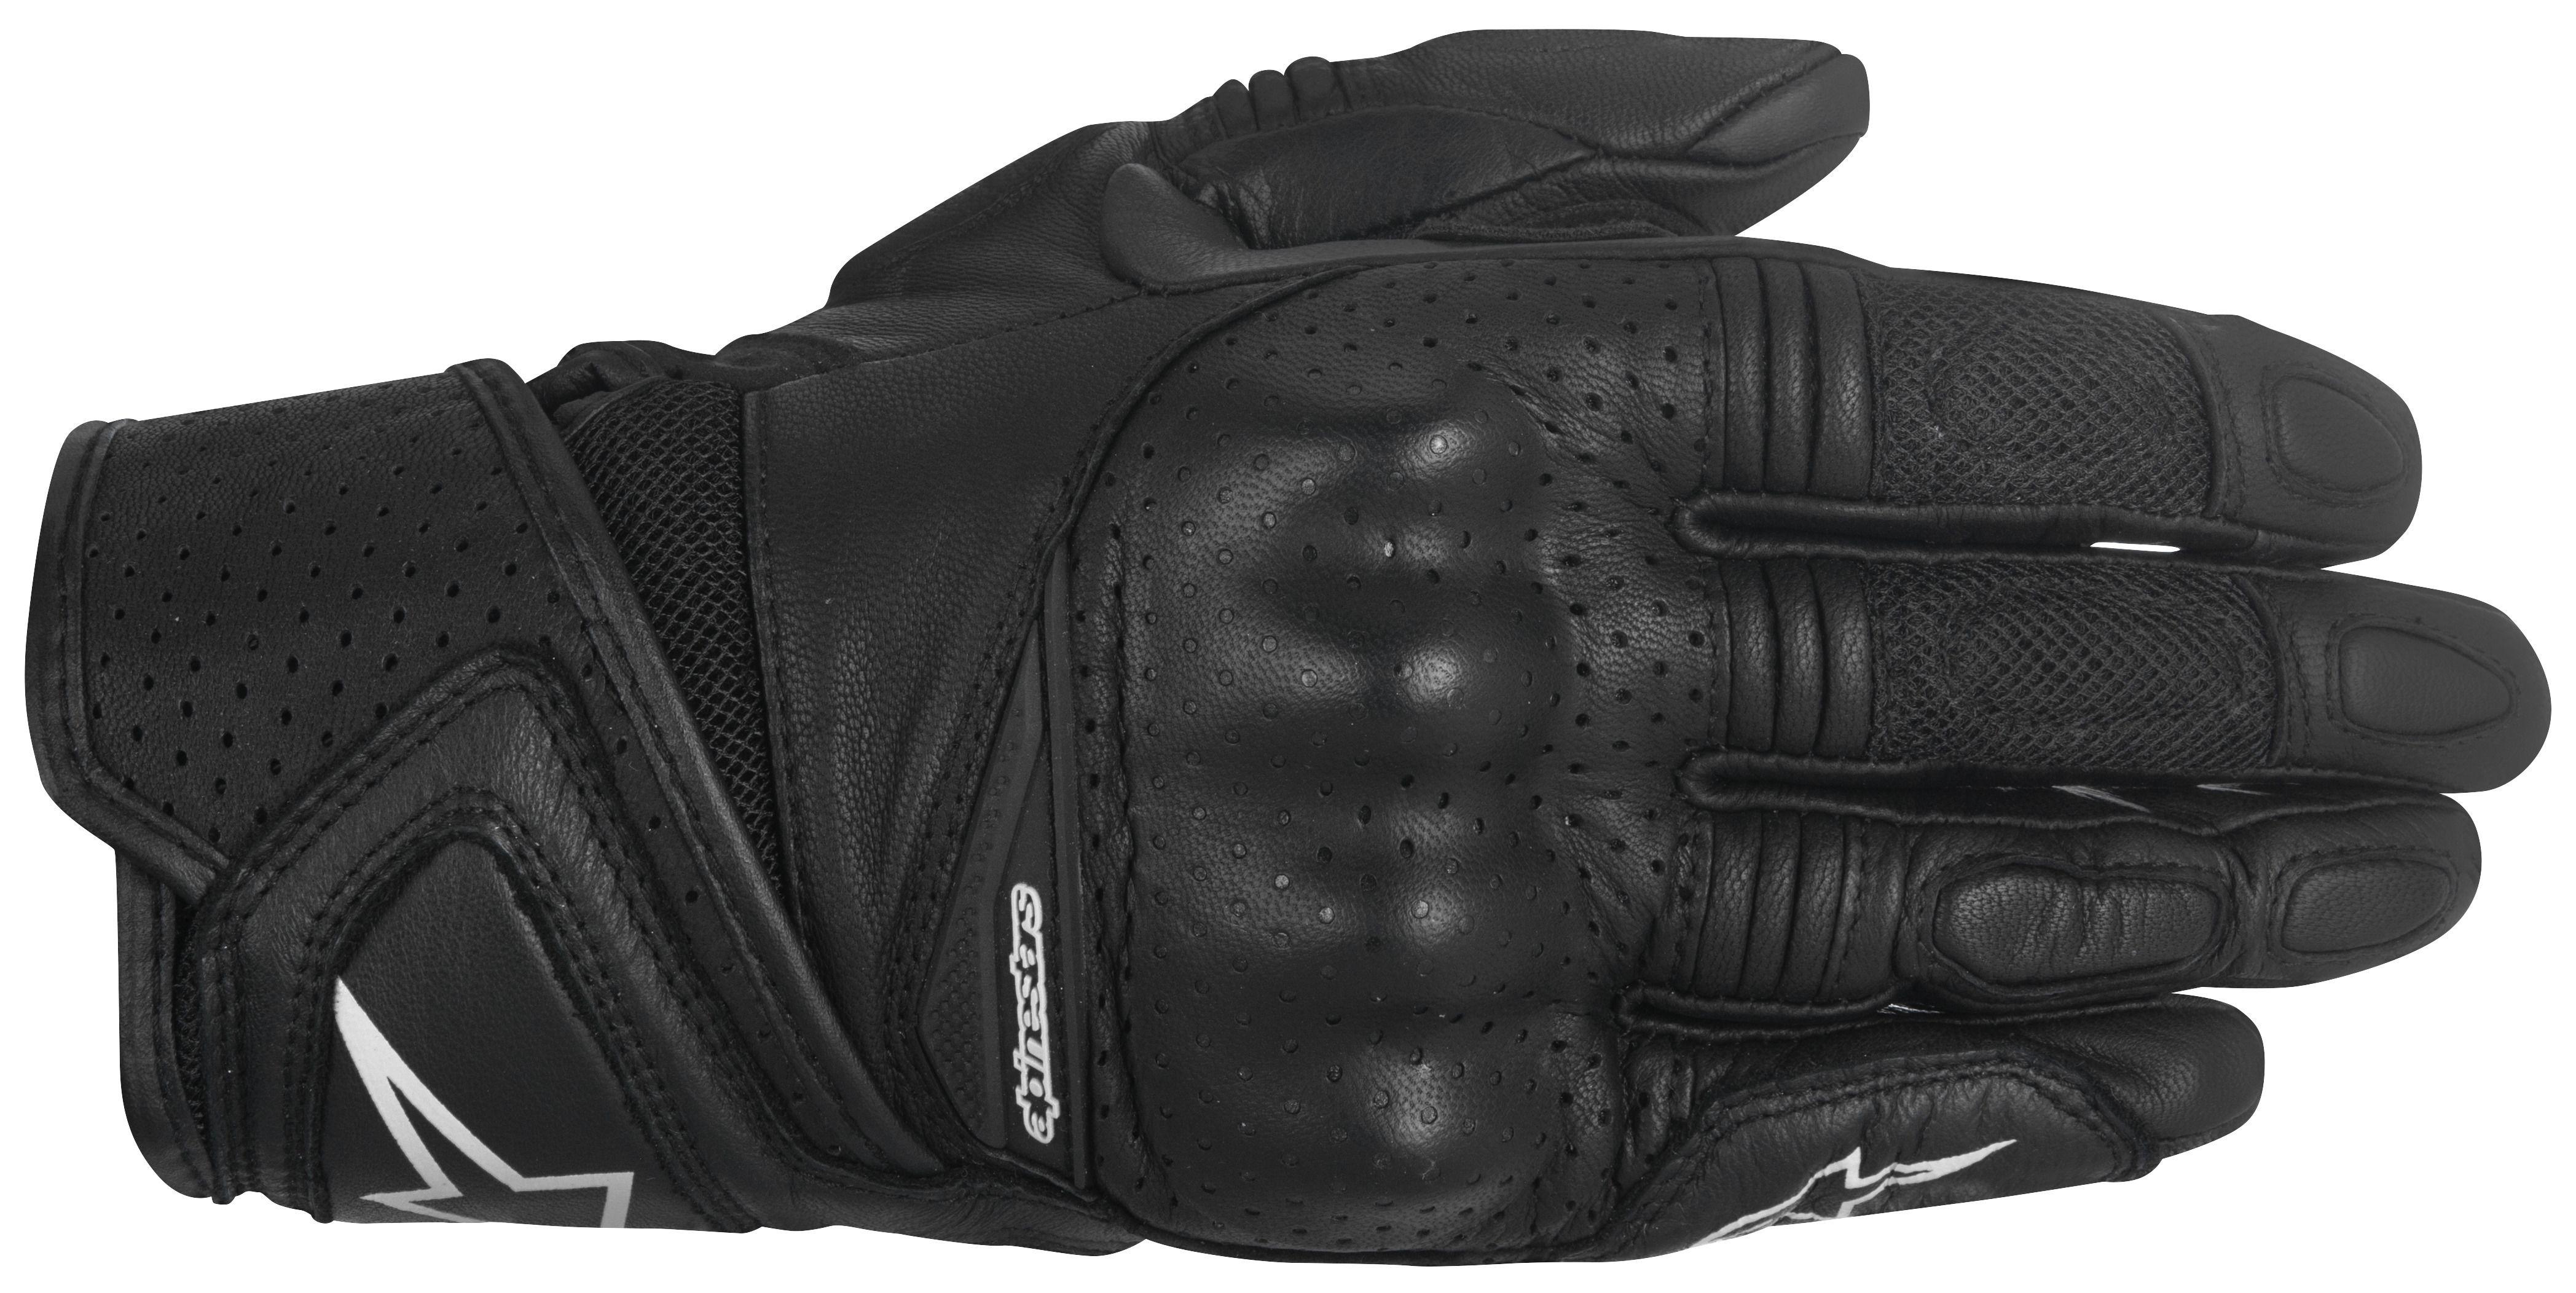 Xs black leather gloves - Xs Black Leather Gloves 27